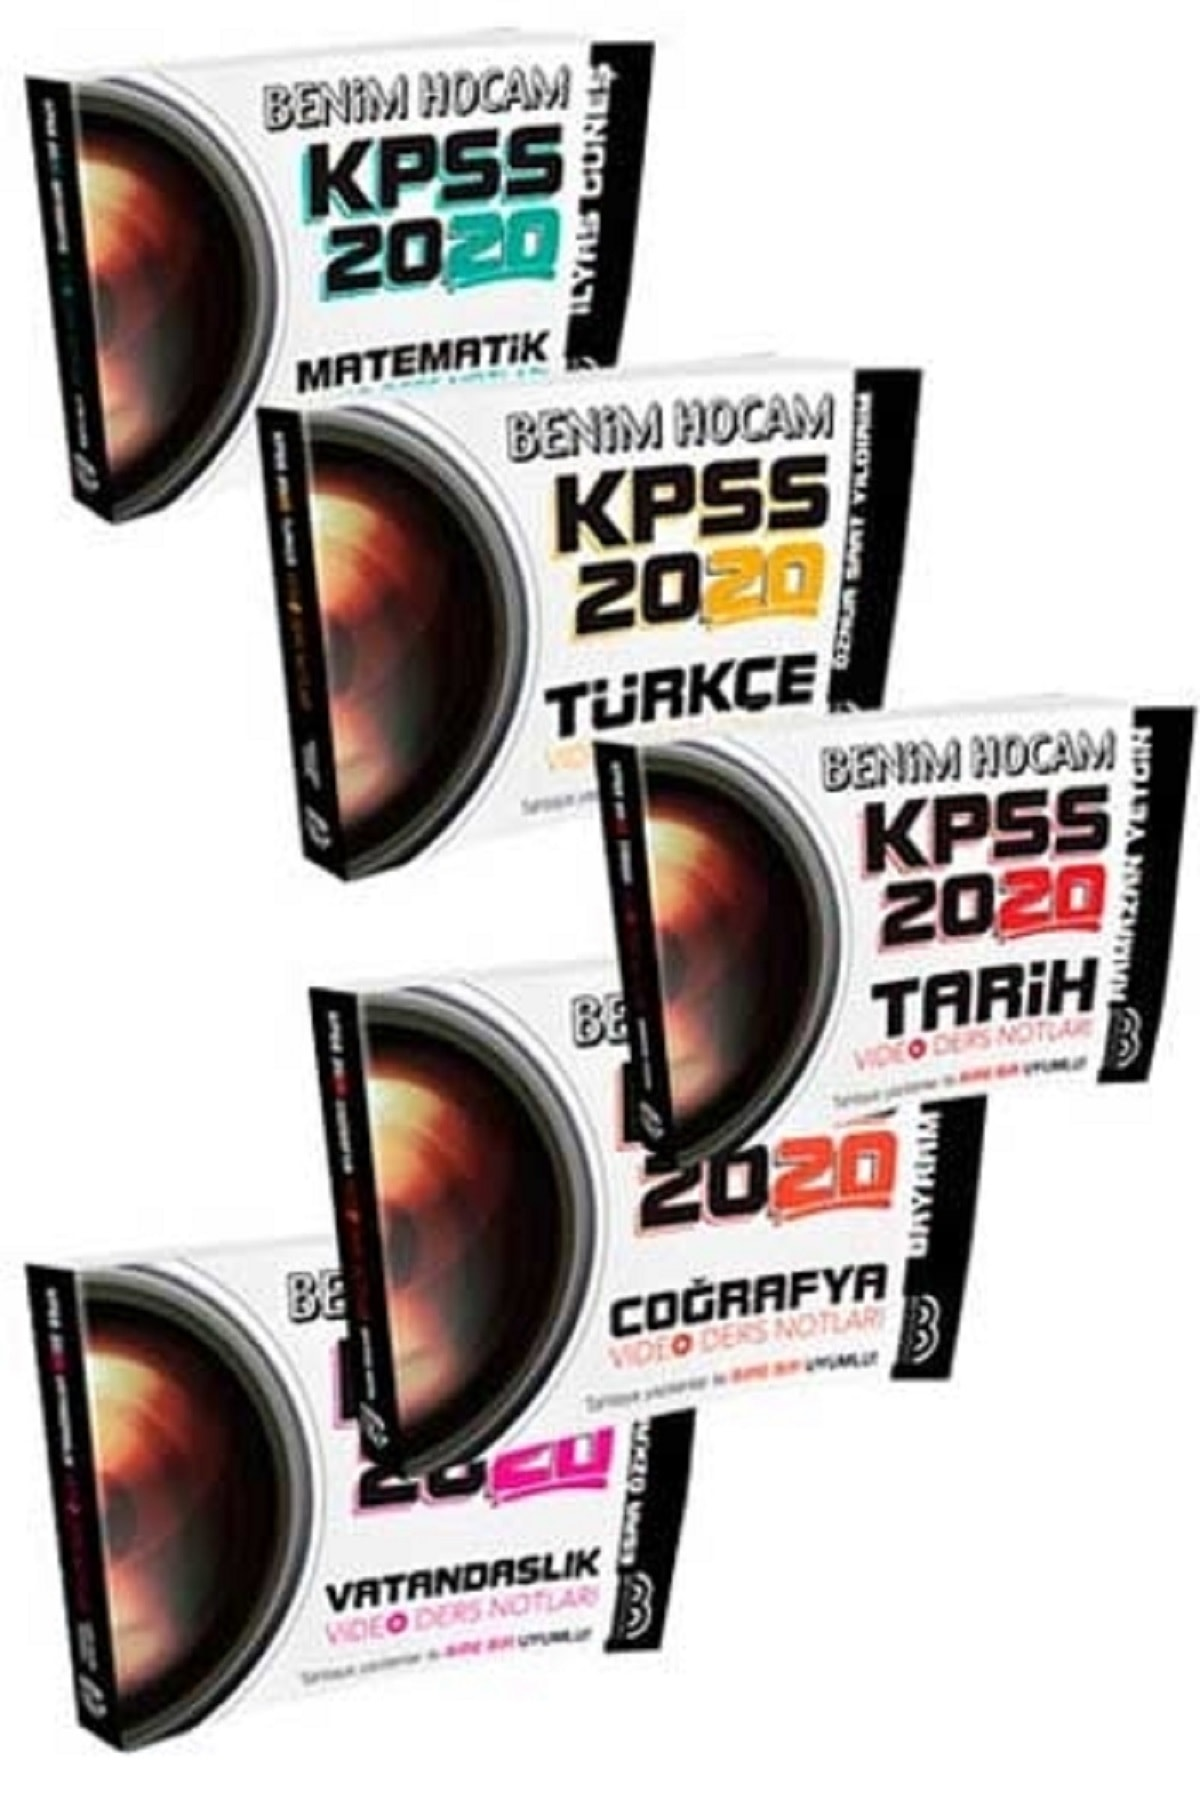 2020 KPSS Genel Yetenek Genel Kültür Video Ders Notları Seti